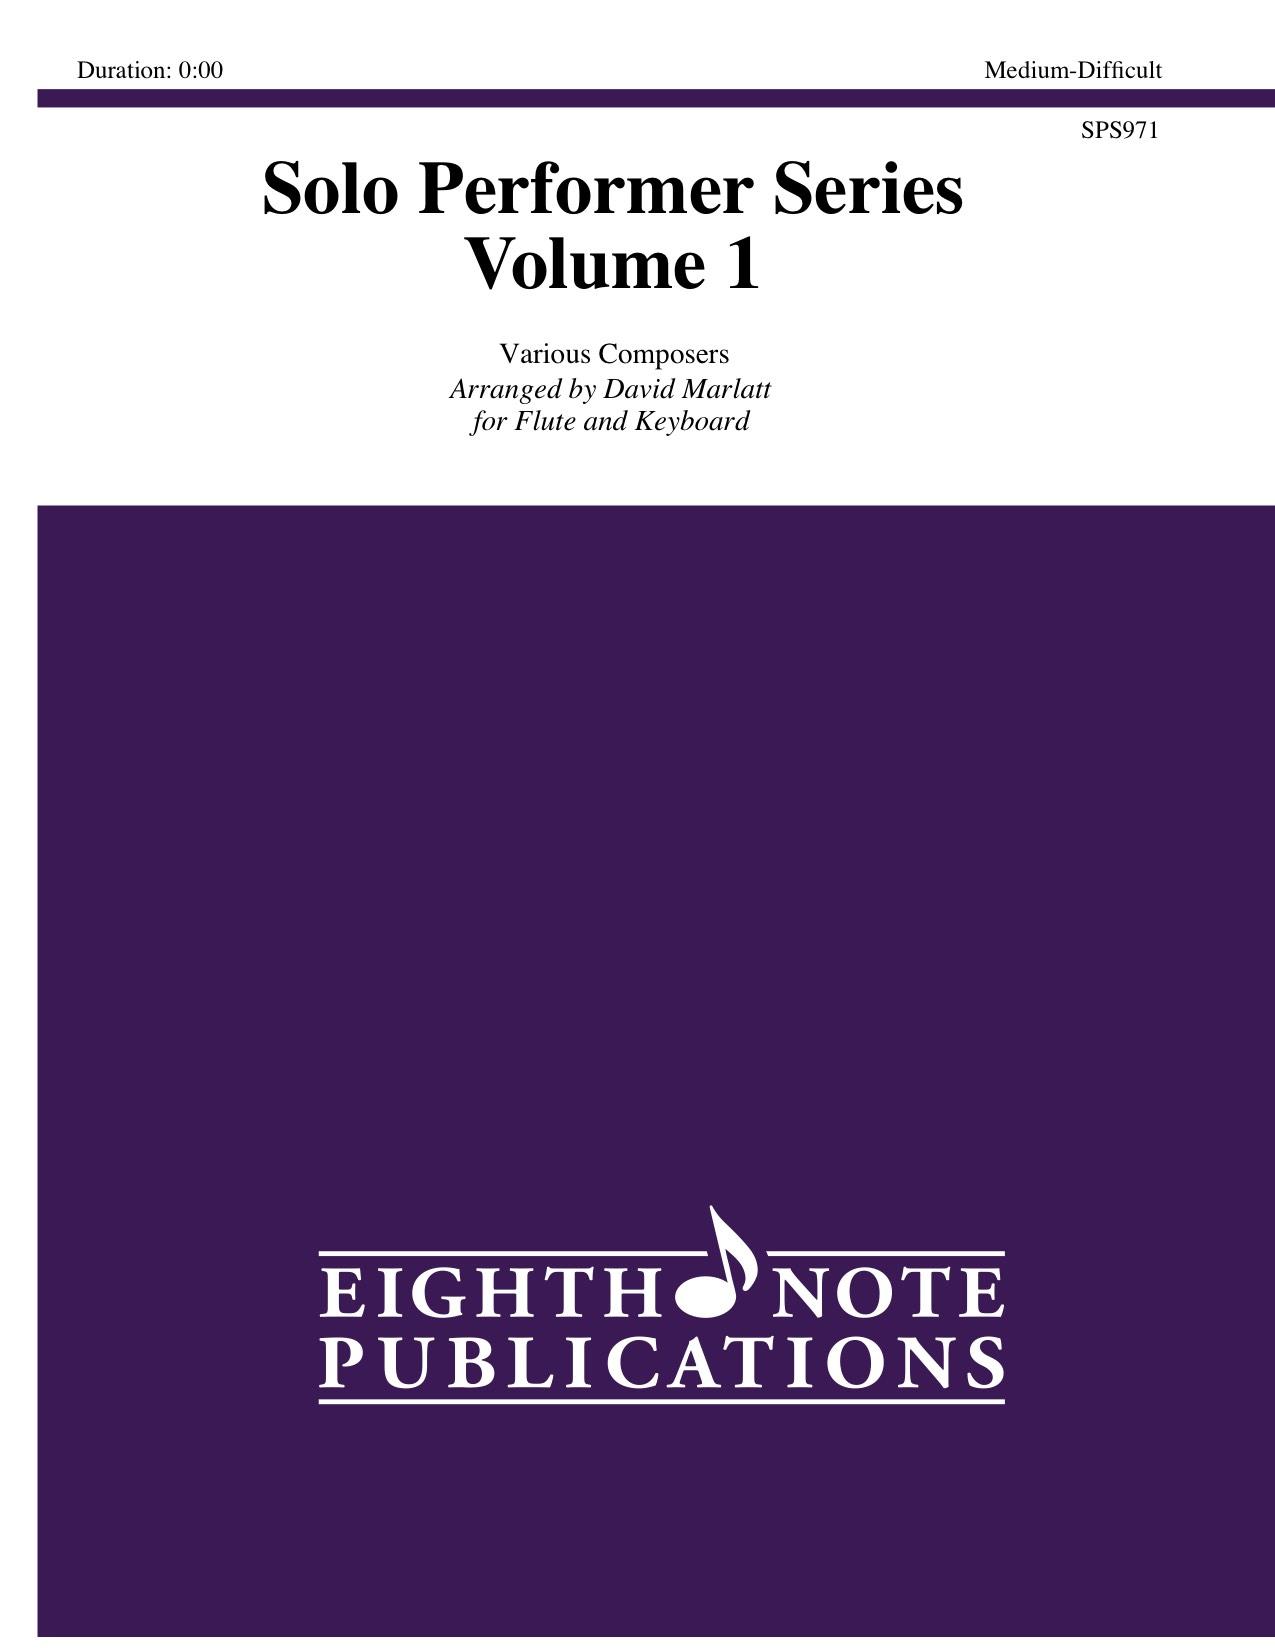 Solo Performer Series - Volume 1 -  Various